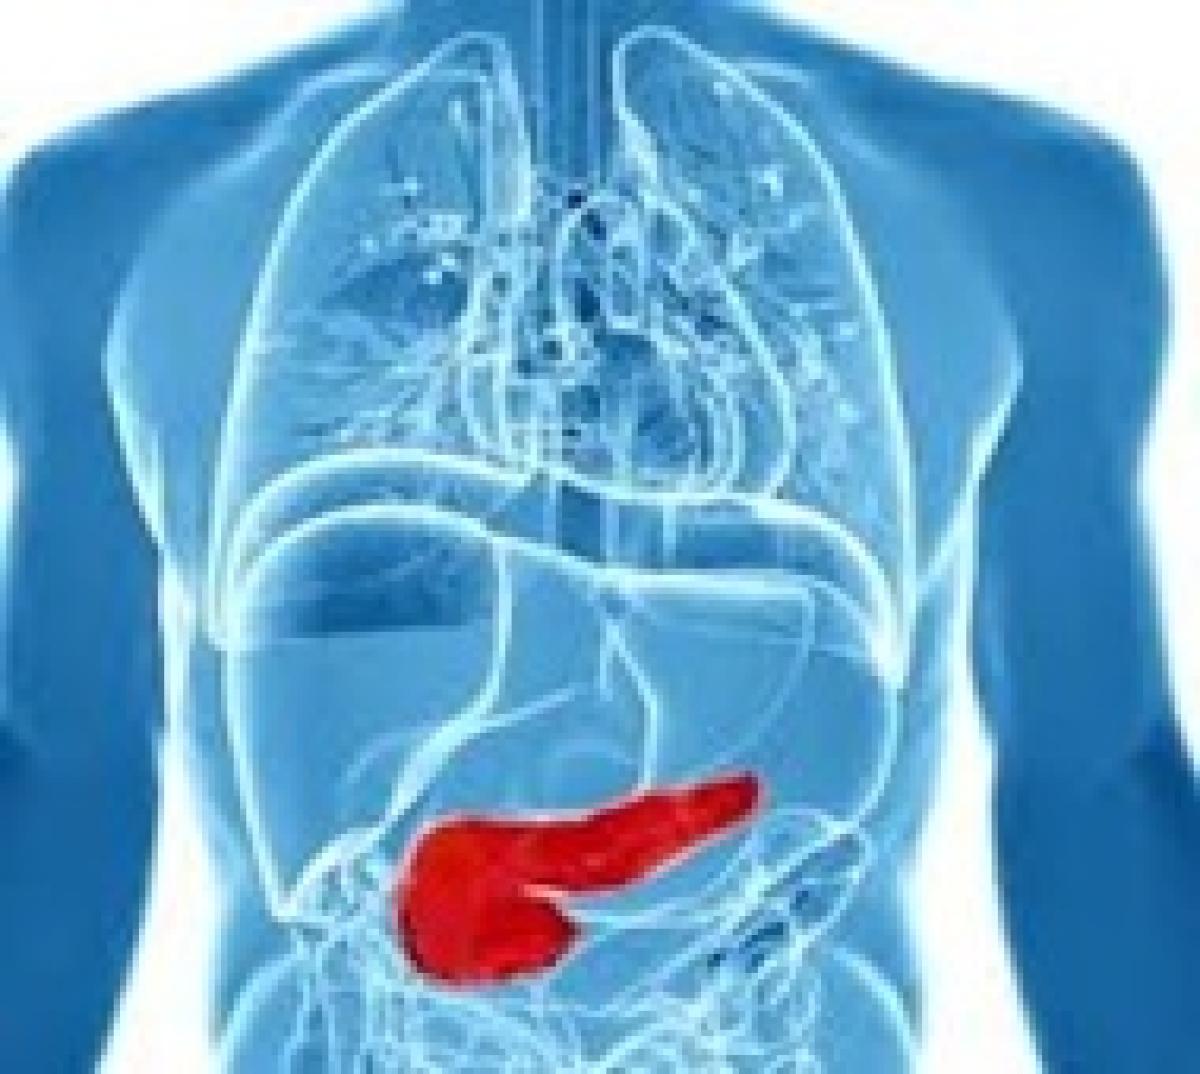 Heart disease drug may treat pancreatic cancer